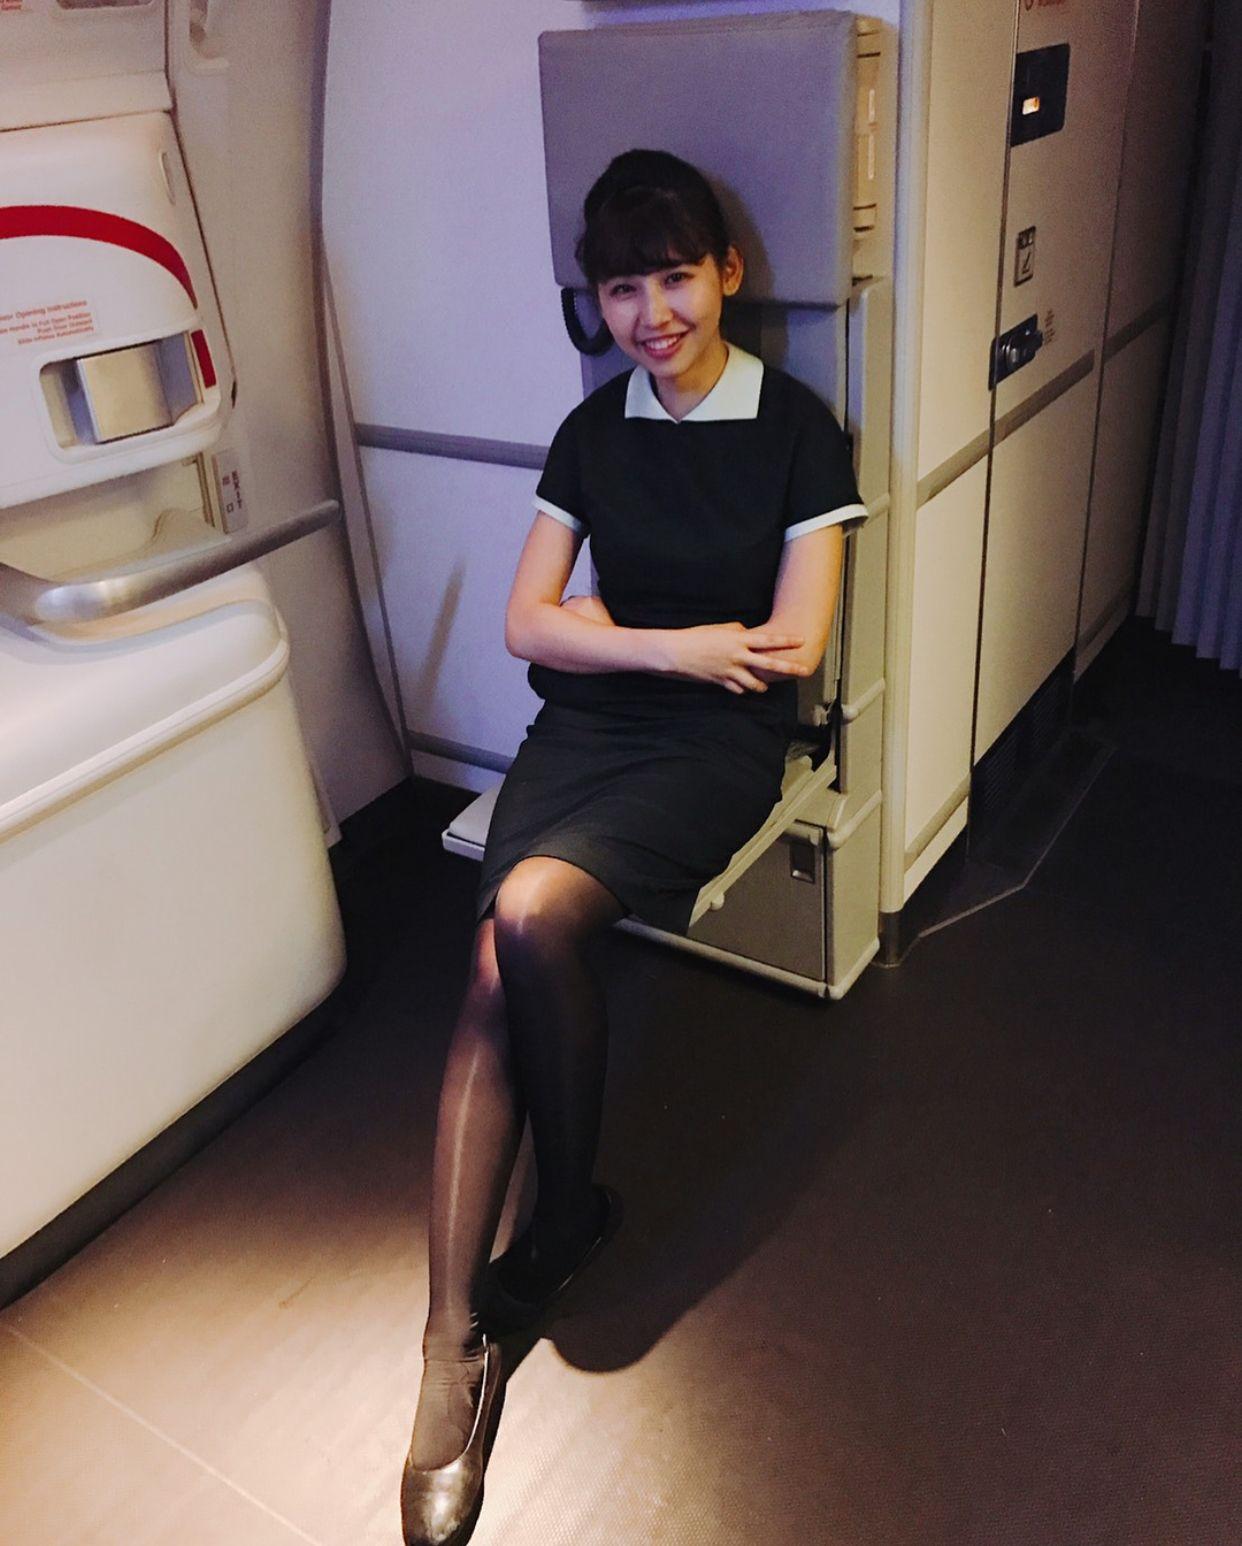 【台湾】エバー航空(長榮航空)客室乗務員/EVA Air cabin crew【Taiwan】 Flight